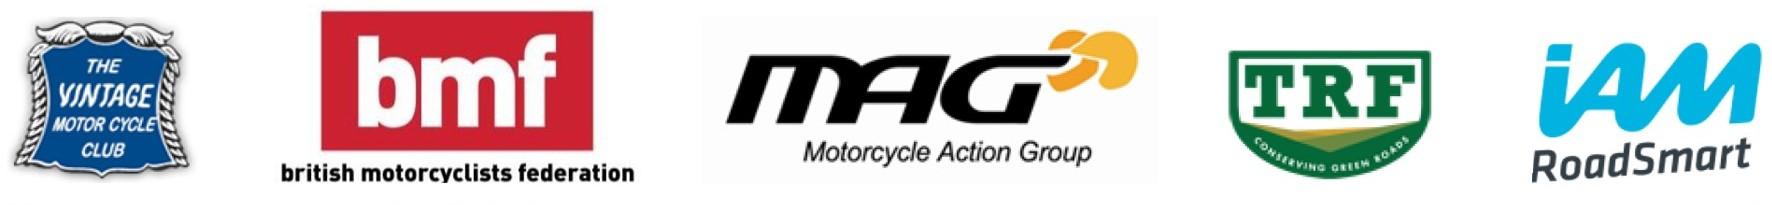 Motorcycle Action Group coalition logos_May 20